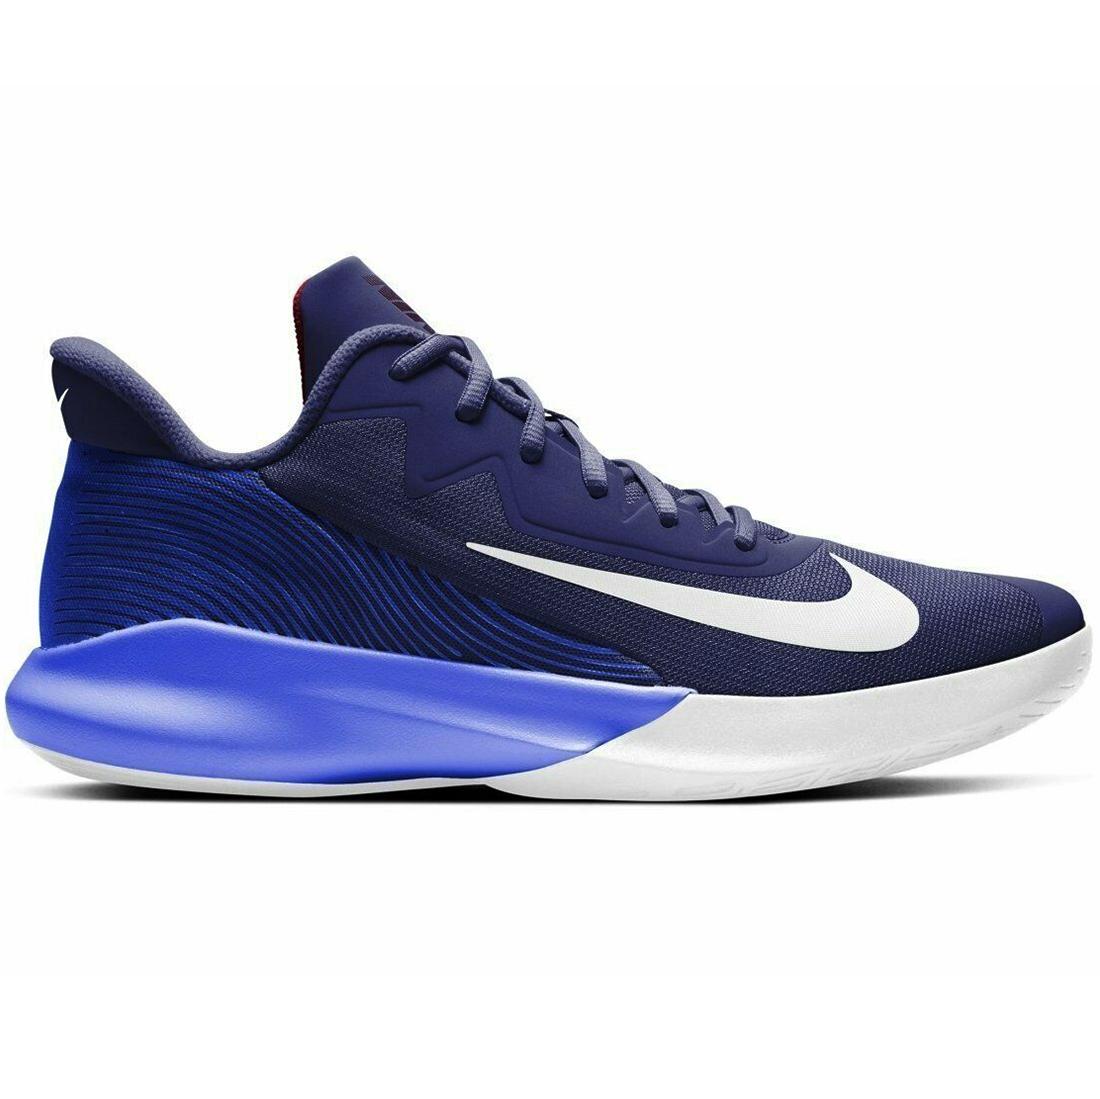 Nike Precision IV Herren Basketballschuh blau weiß CK1069 400